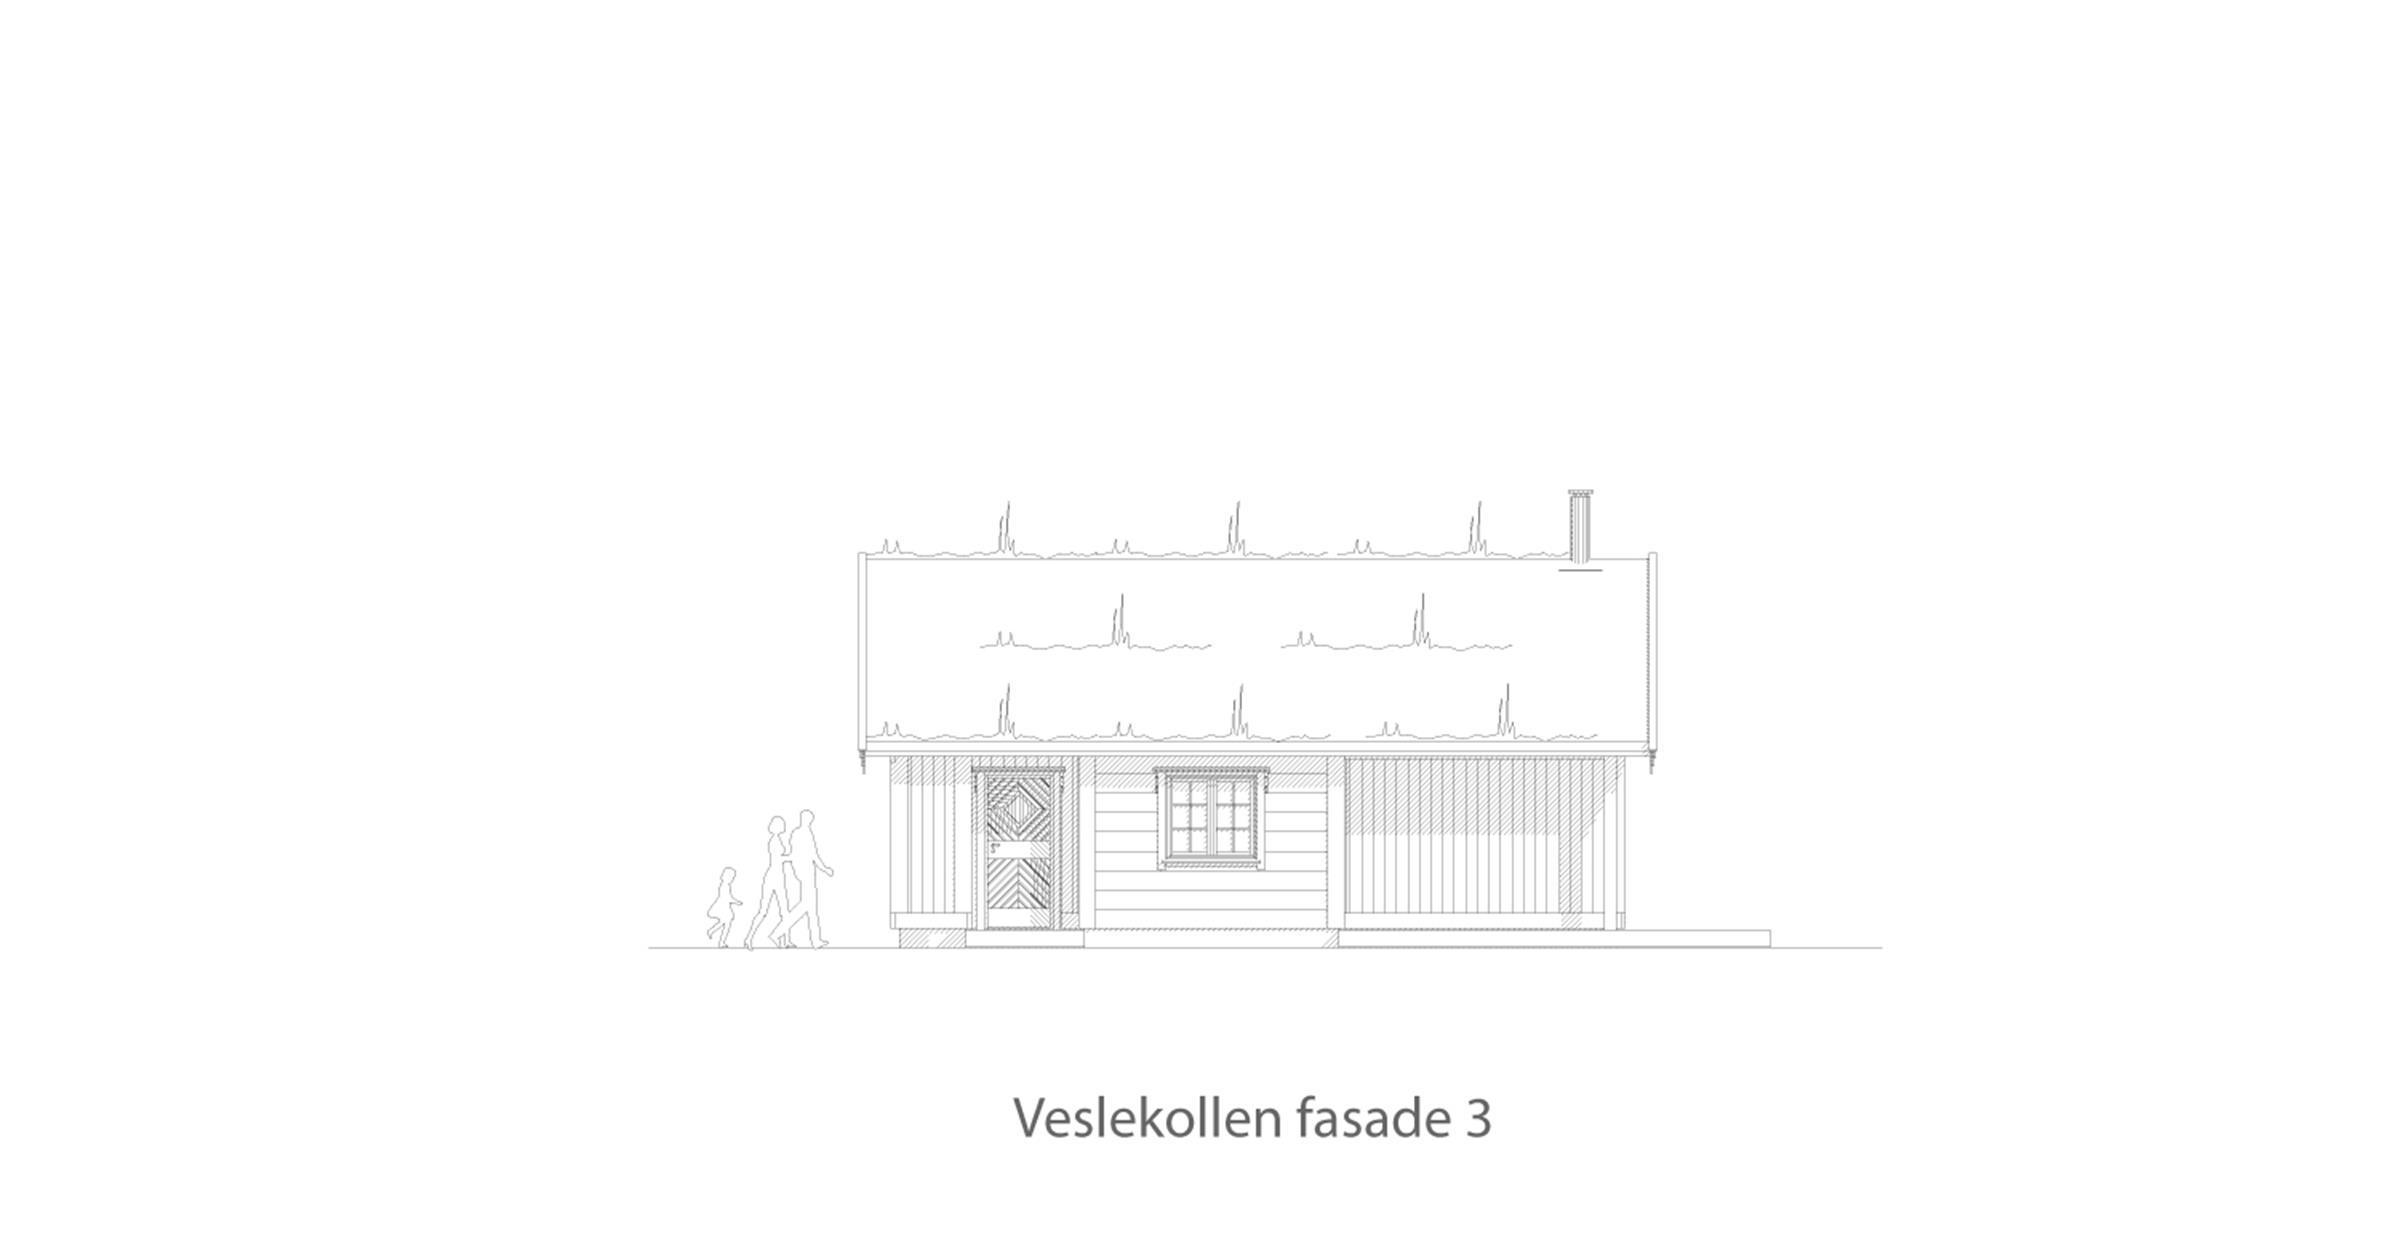 Veslekollen fasade 3